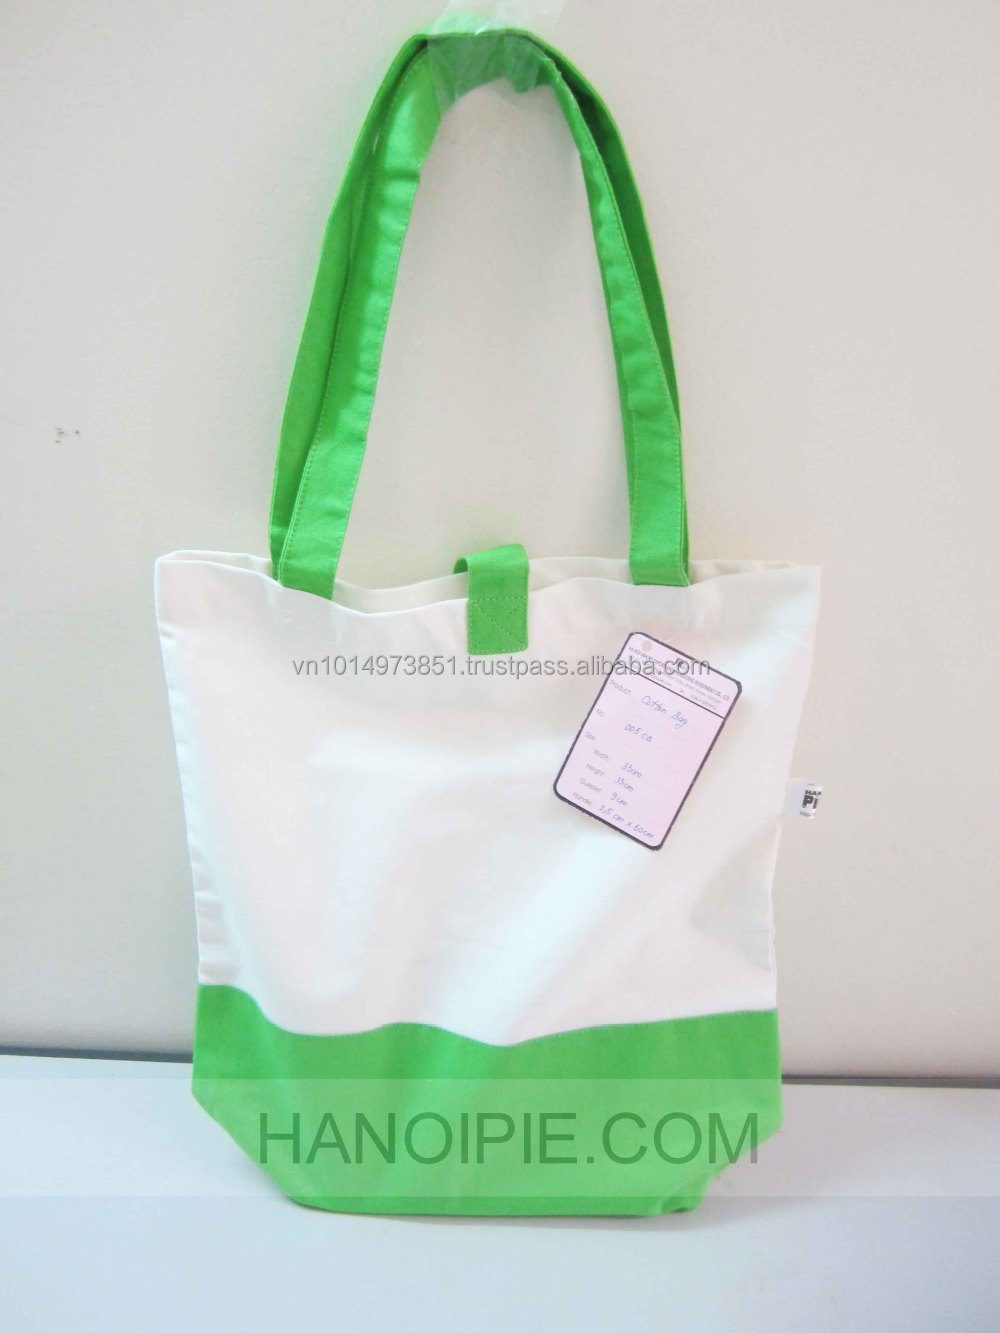 Promotional Cotton Bag  Gift Bags Wholesale 005CB.jpg